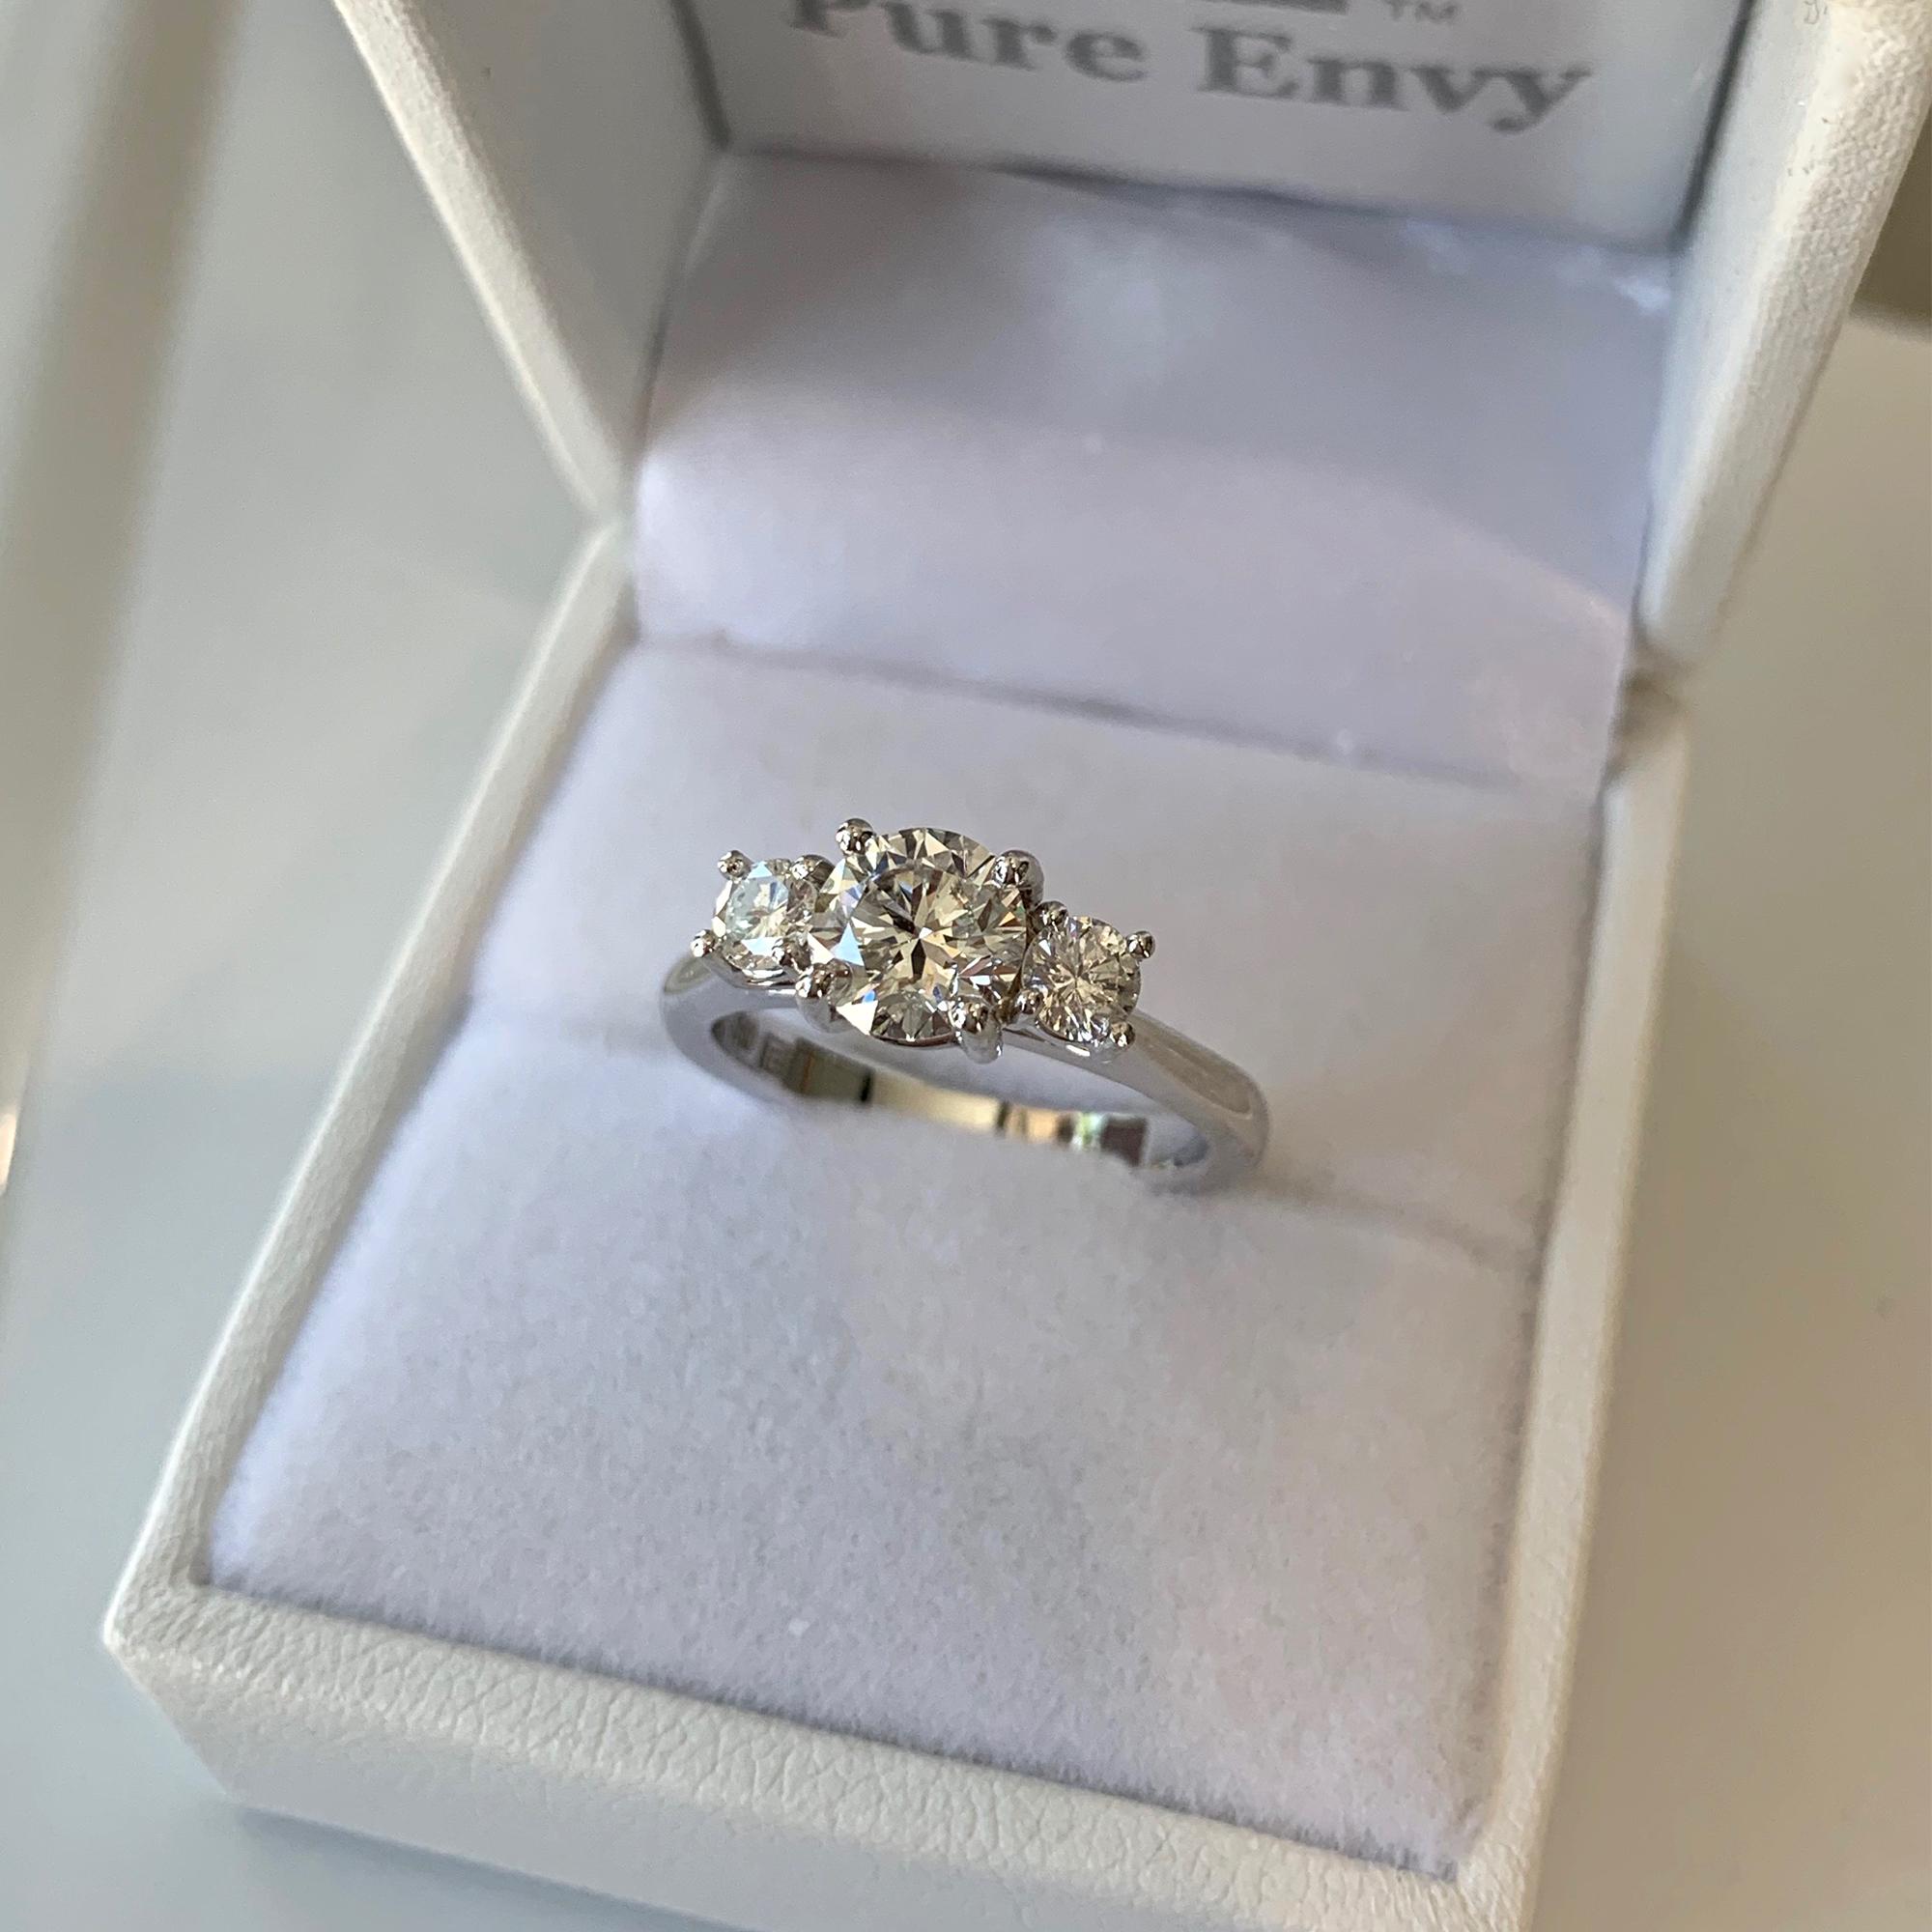 3 stone engagement rings adelaide